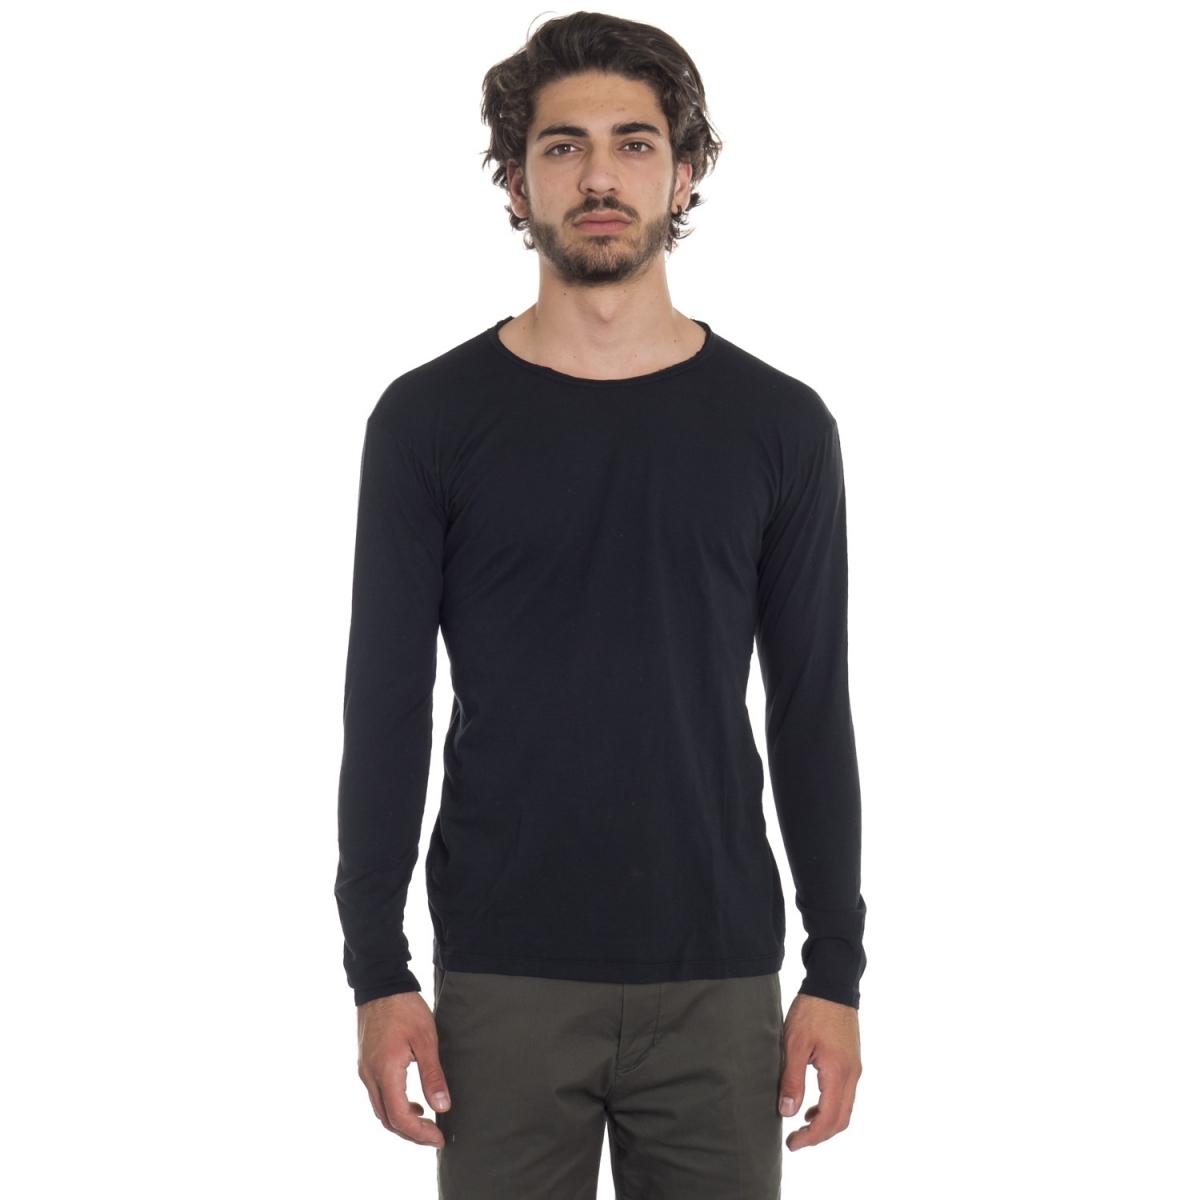 clothing T-shirt men T-Shirt LP23BASICML LANDEK PARK Cafedelmar Shop